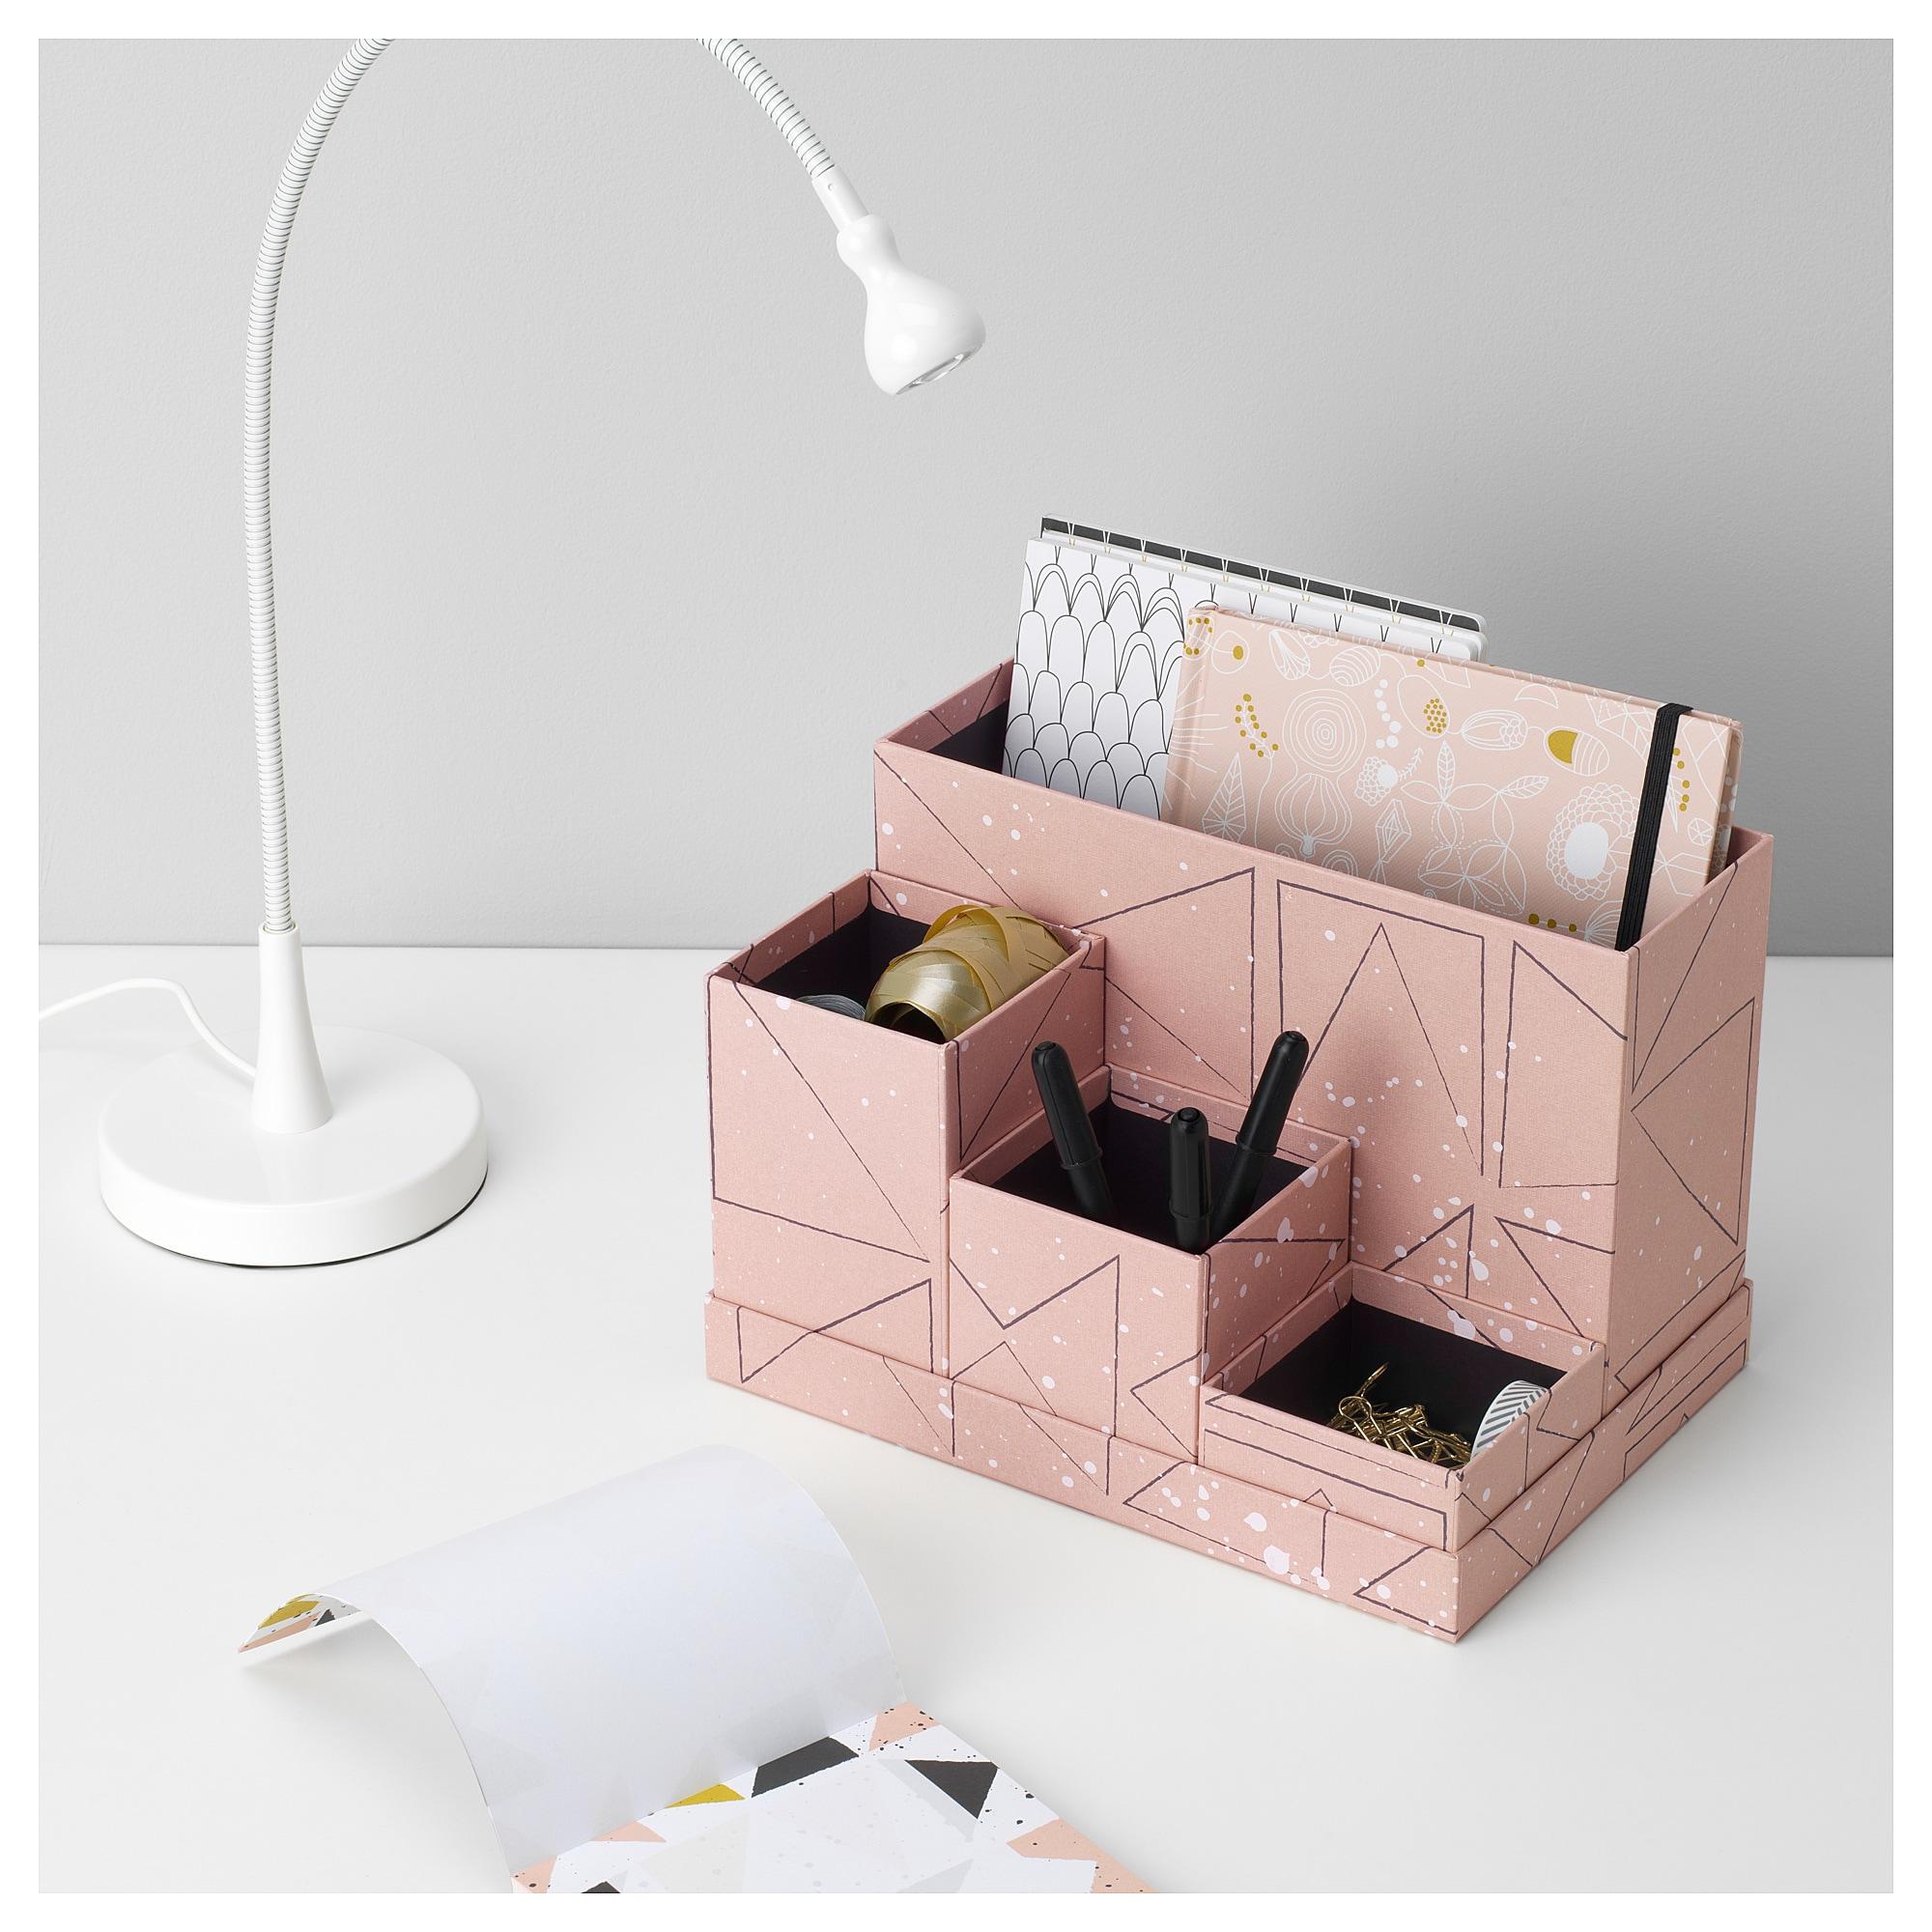 Fresh Home Furnishing Ideas And Affordable Furniture Desk Organization Ikea Desk Organization Organization Bedroom